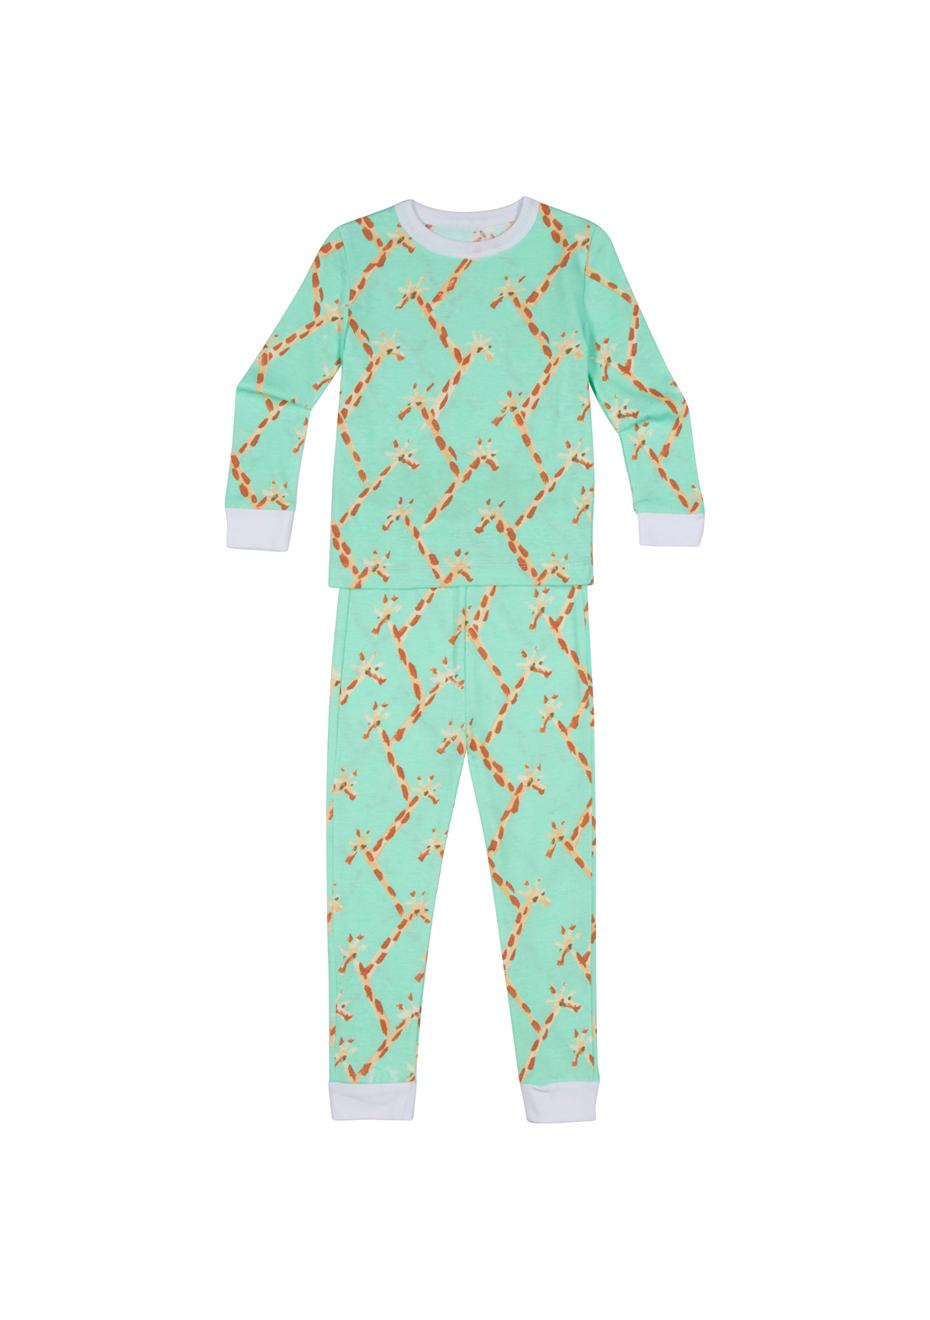 Sant and Abel Kids Zebra Snug Fit Black and White Cotton Pajama Set